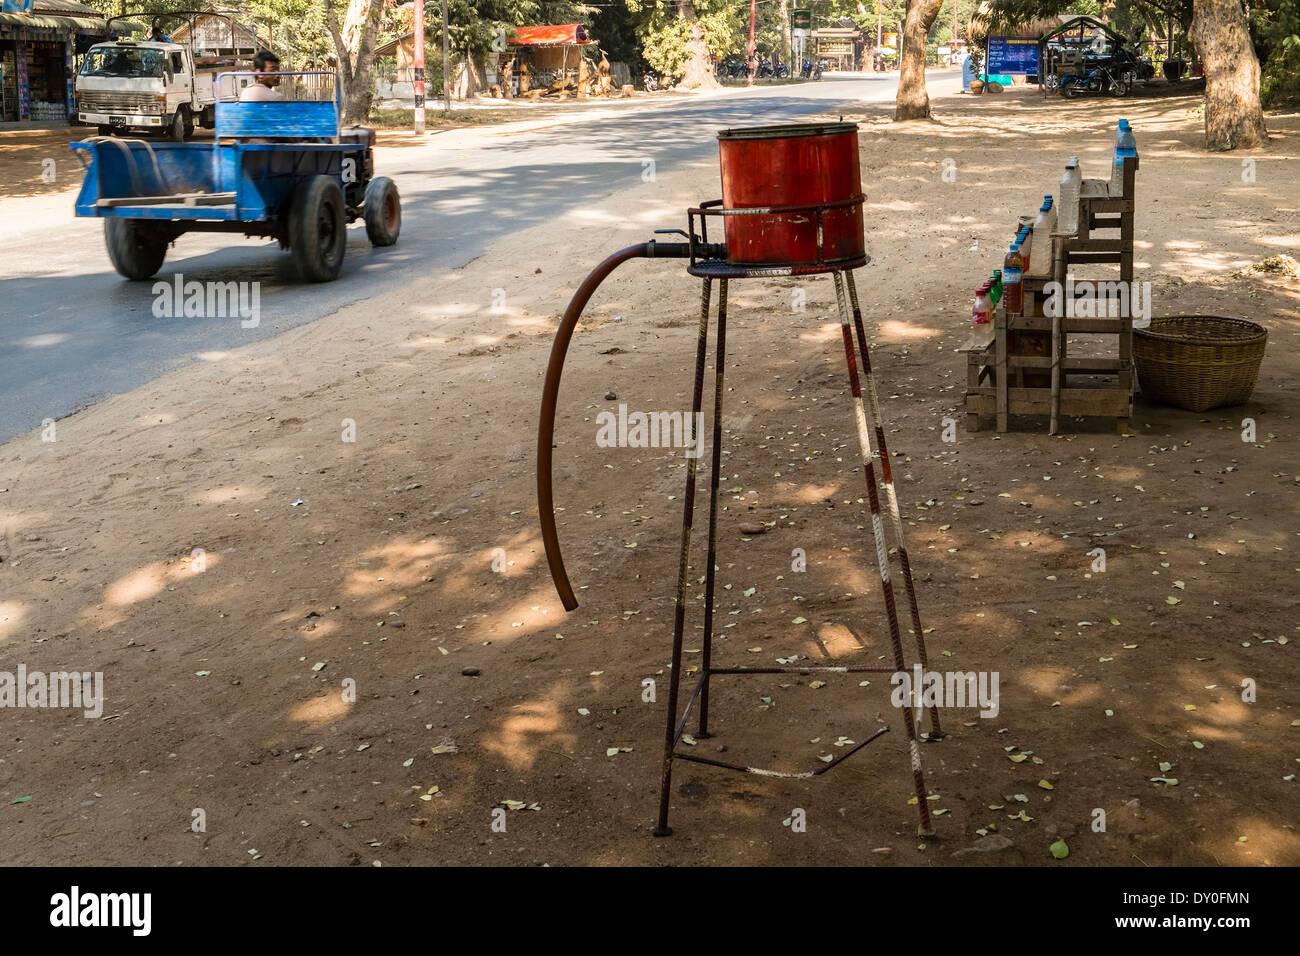 Filling station, Nyaung U, Bagan, Mandalay Division, Myanmar, Asia Stock Photo